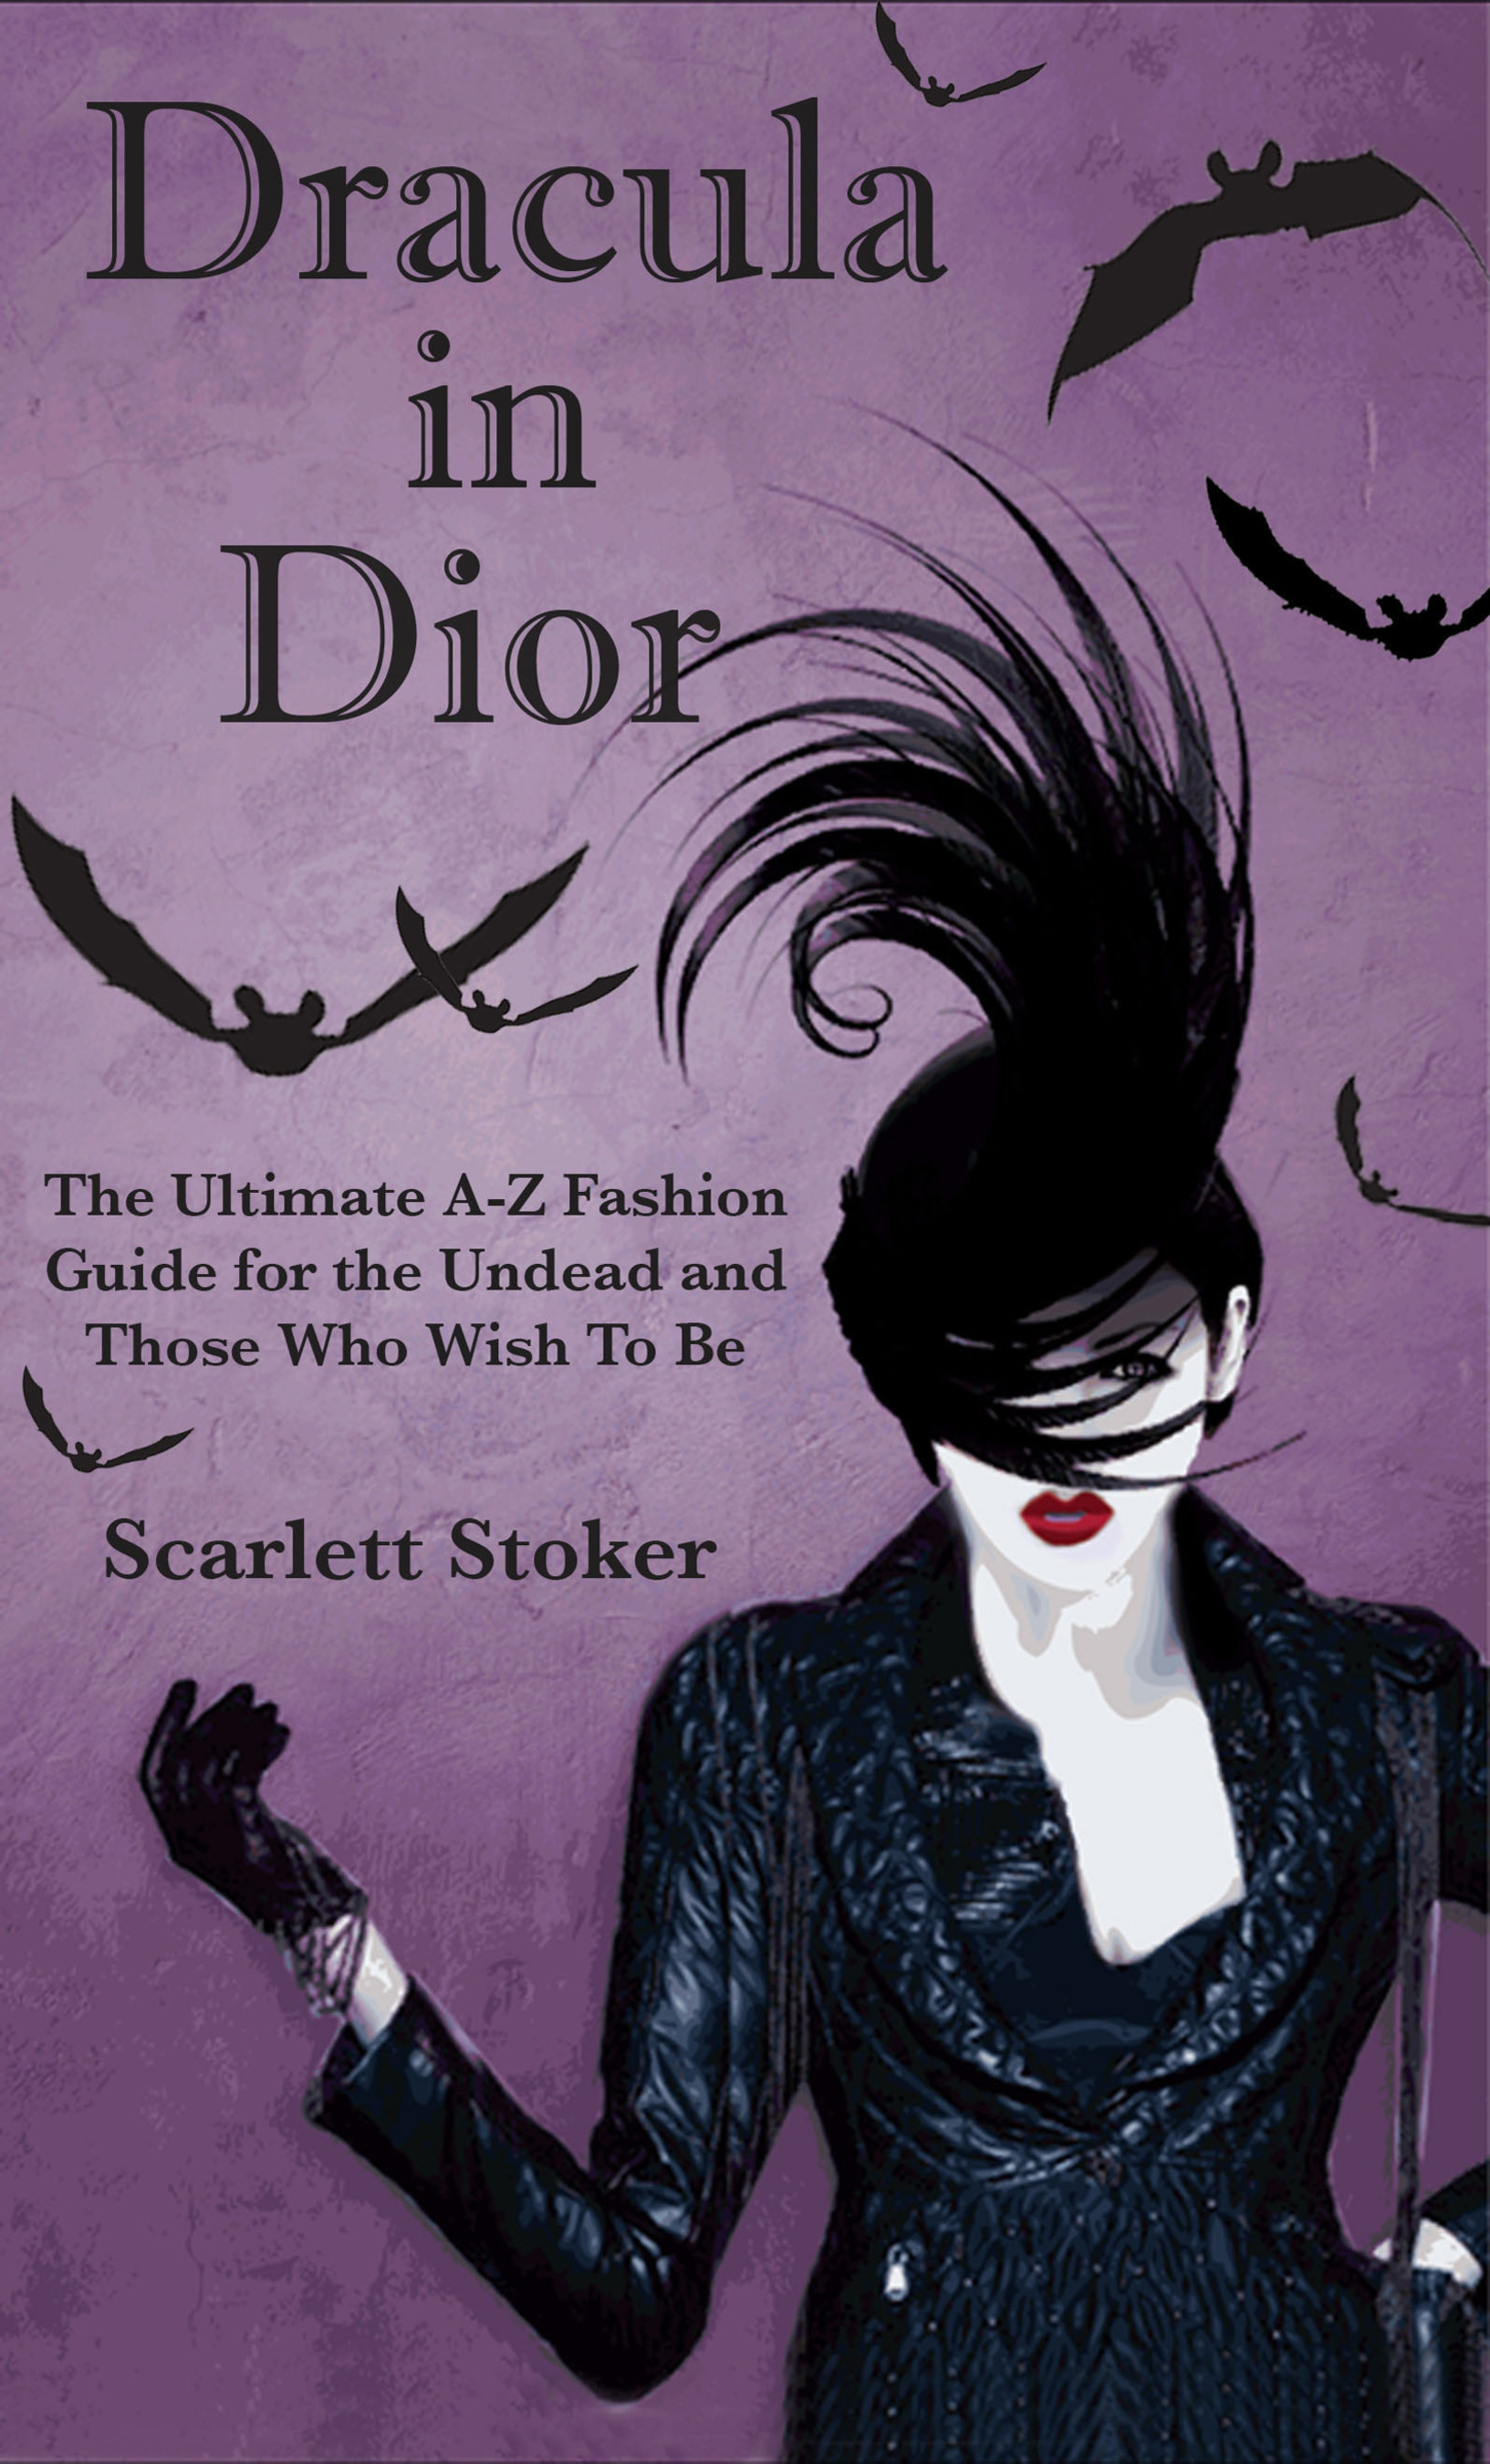 Dracula in Dior cover.  (PRNewsFoto/Scarlett Stoker)